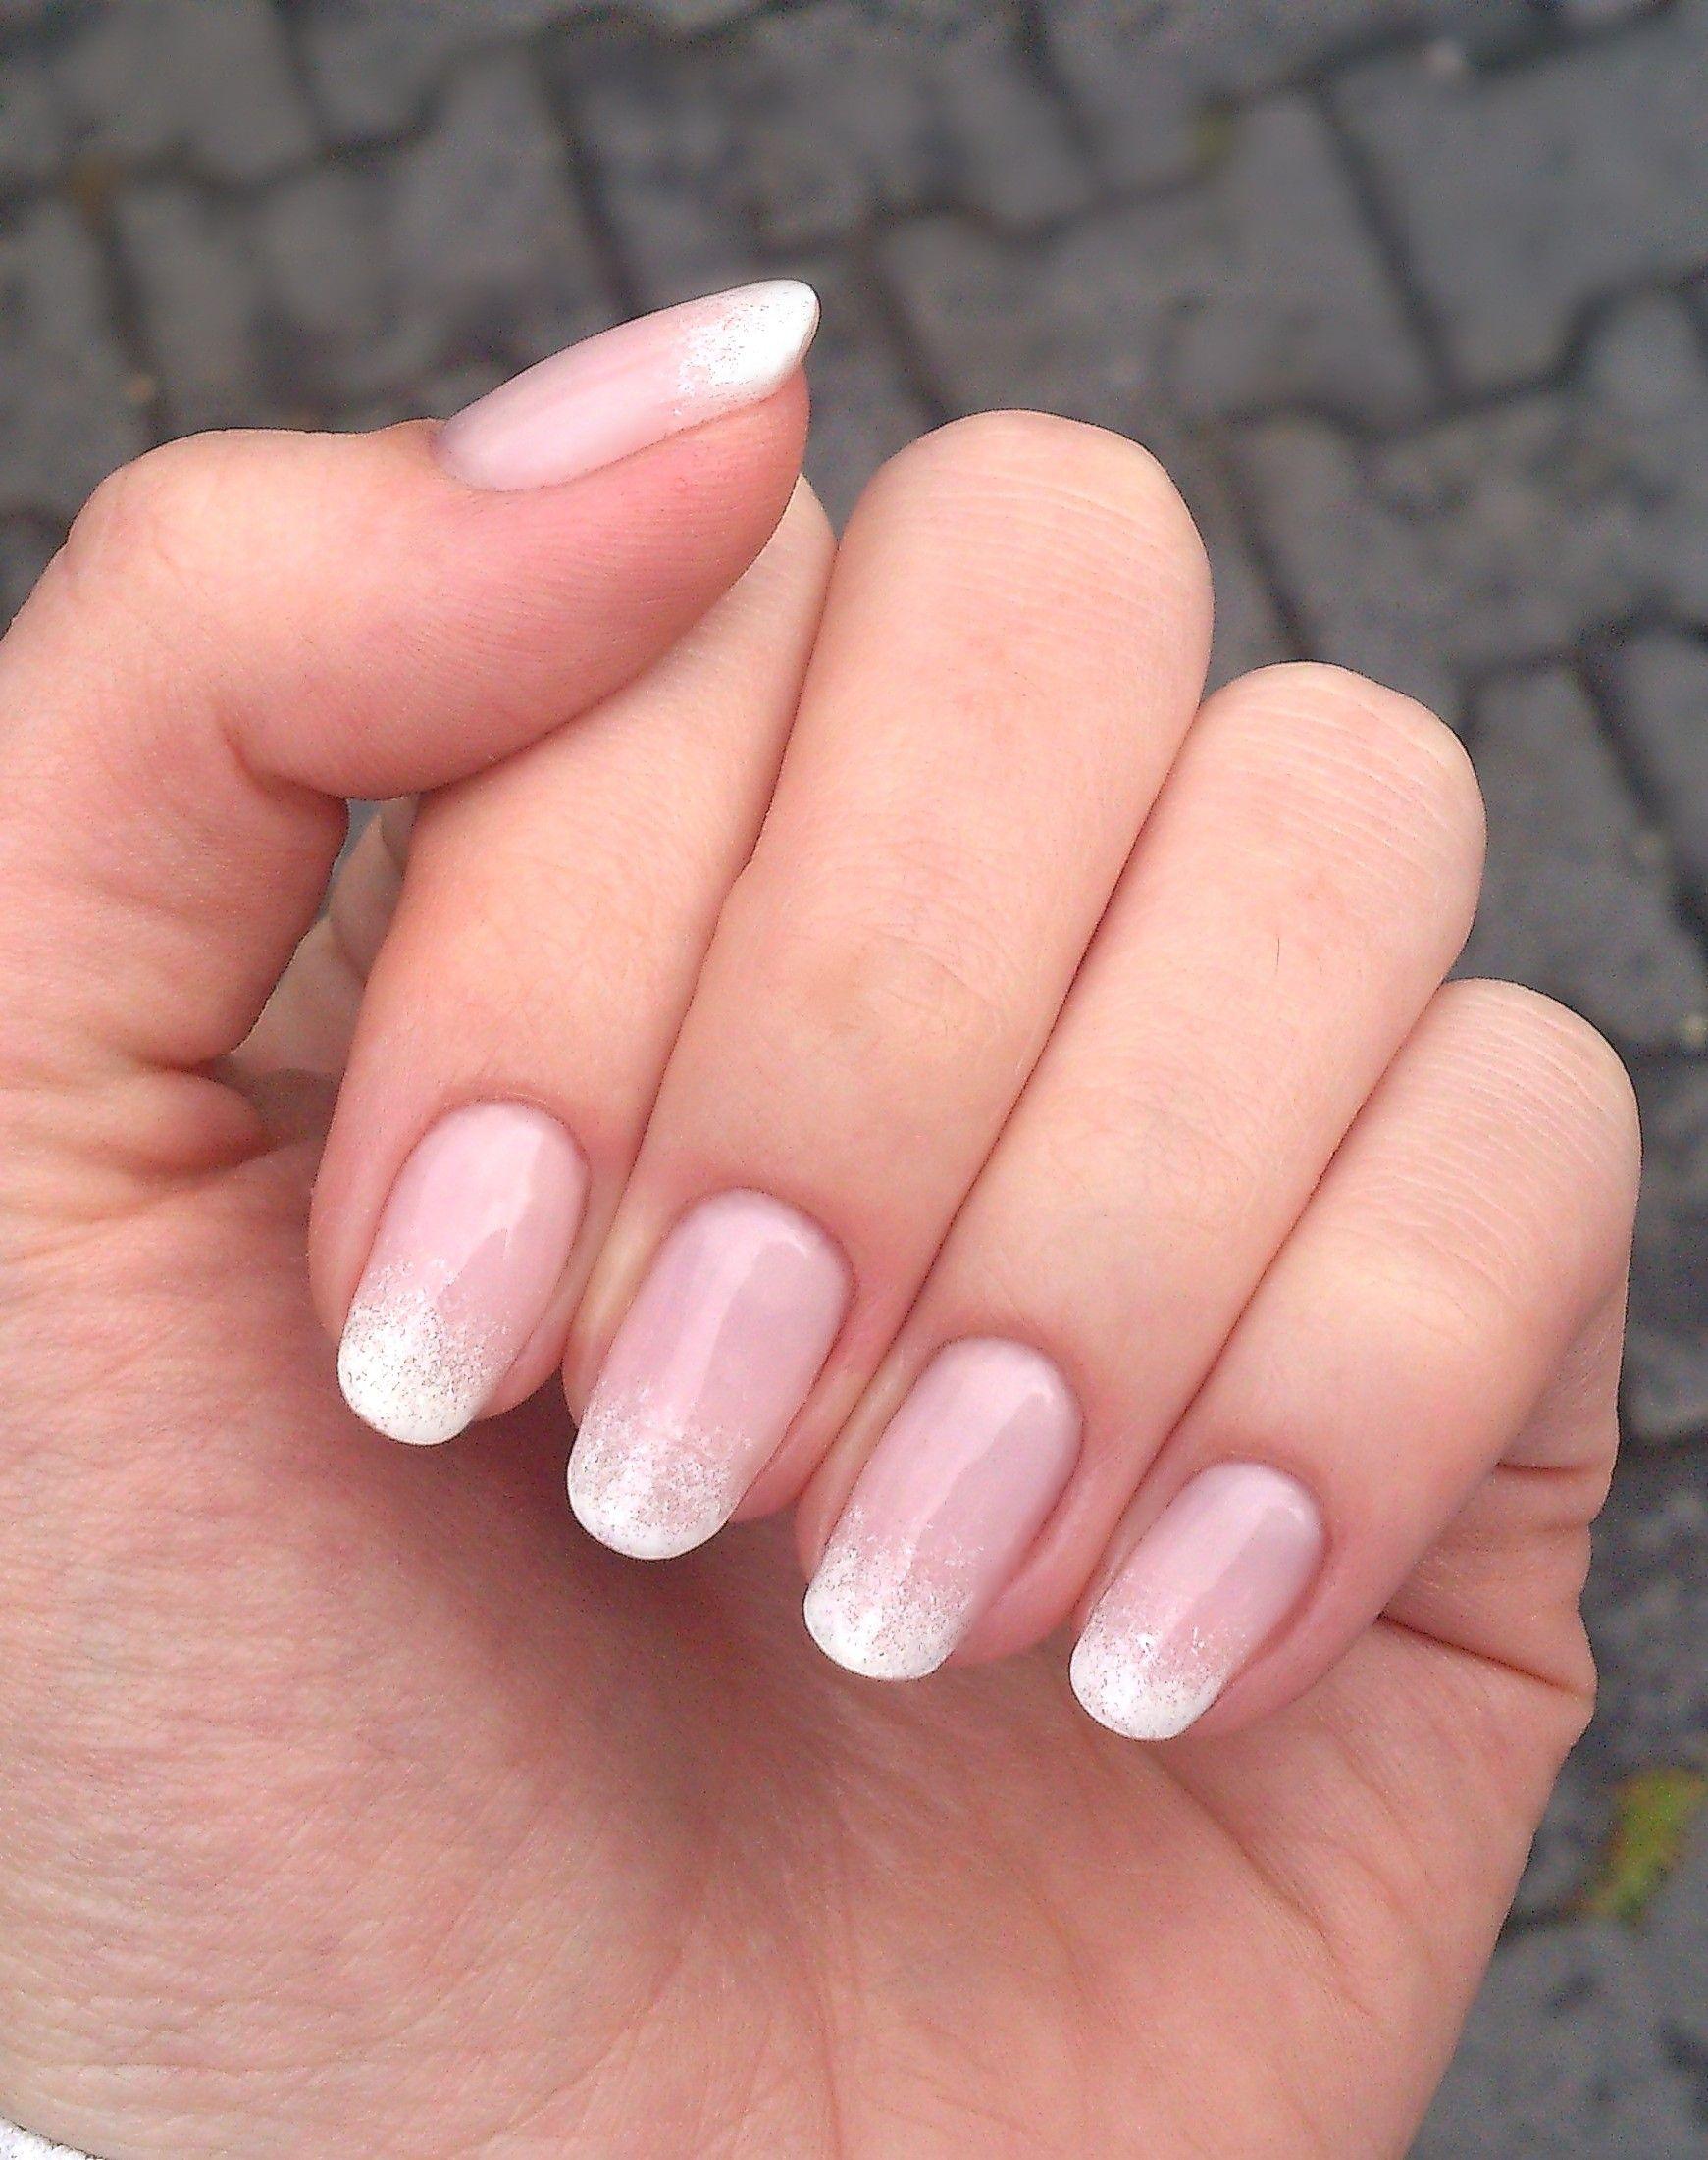 Nagelform oval? | Nägel | Pinterest | Nagelform und Nagelschere